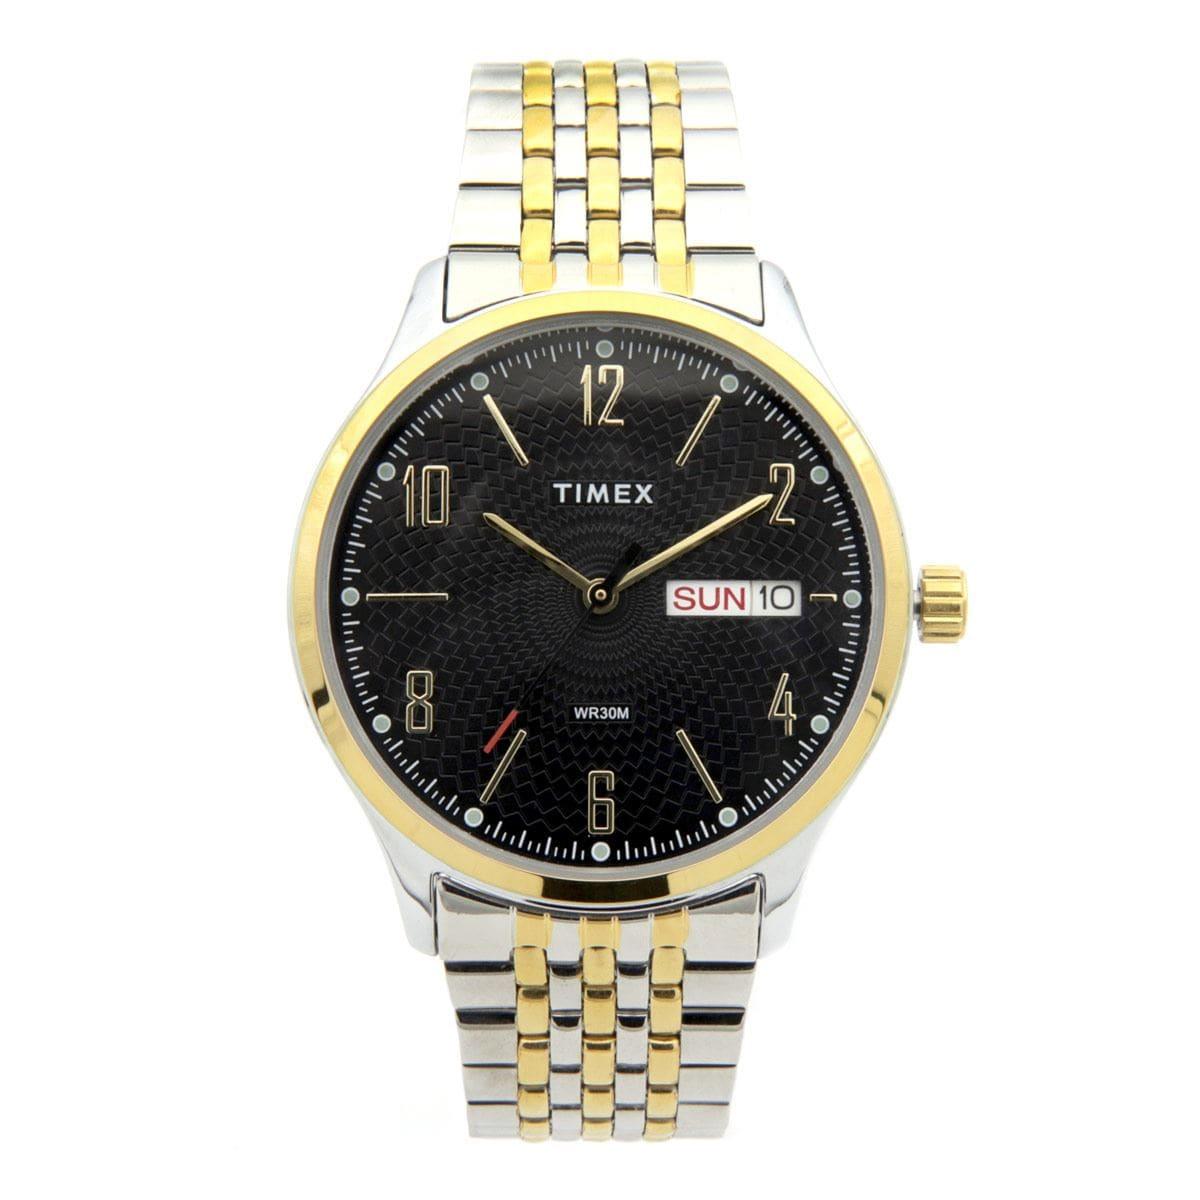 Reloj para Caballero Timex Negro y Plateado